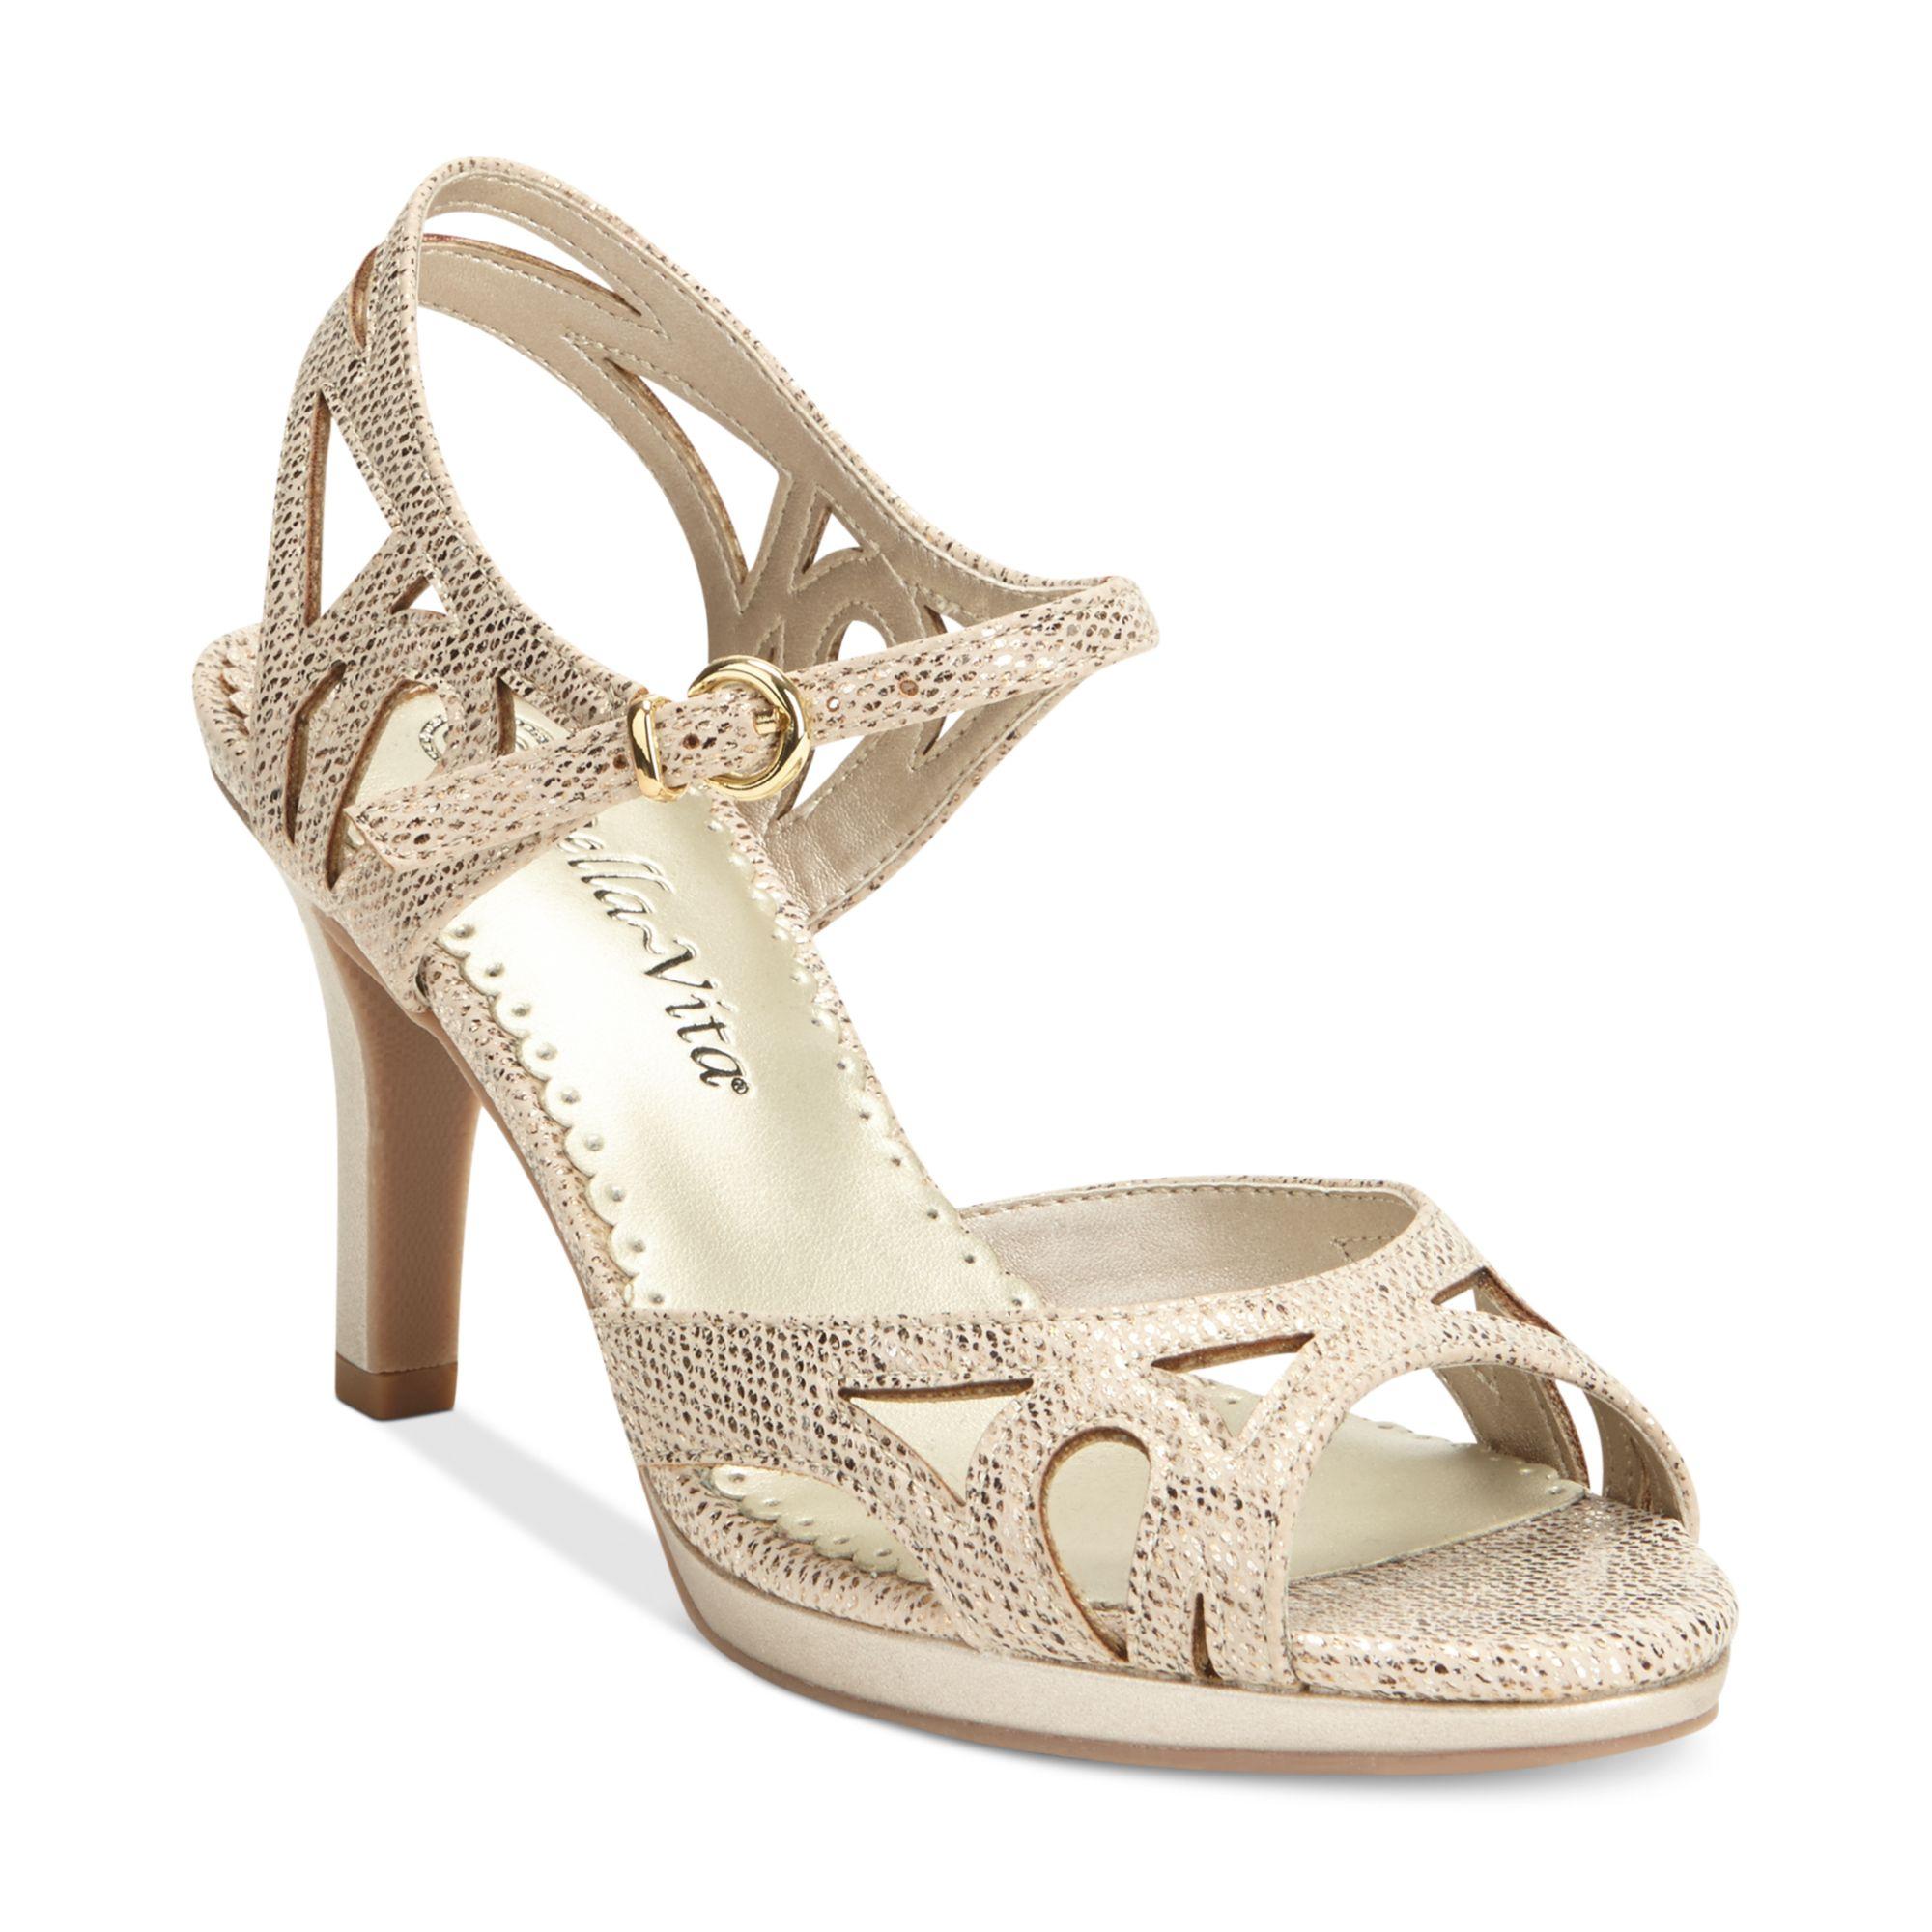 Bella vita claudette ii platform sandals lyst for The bella vita